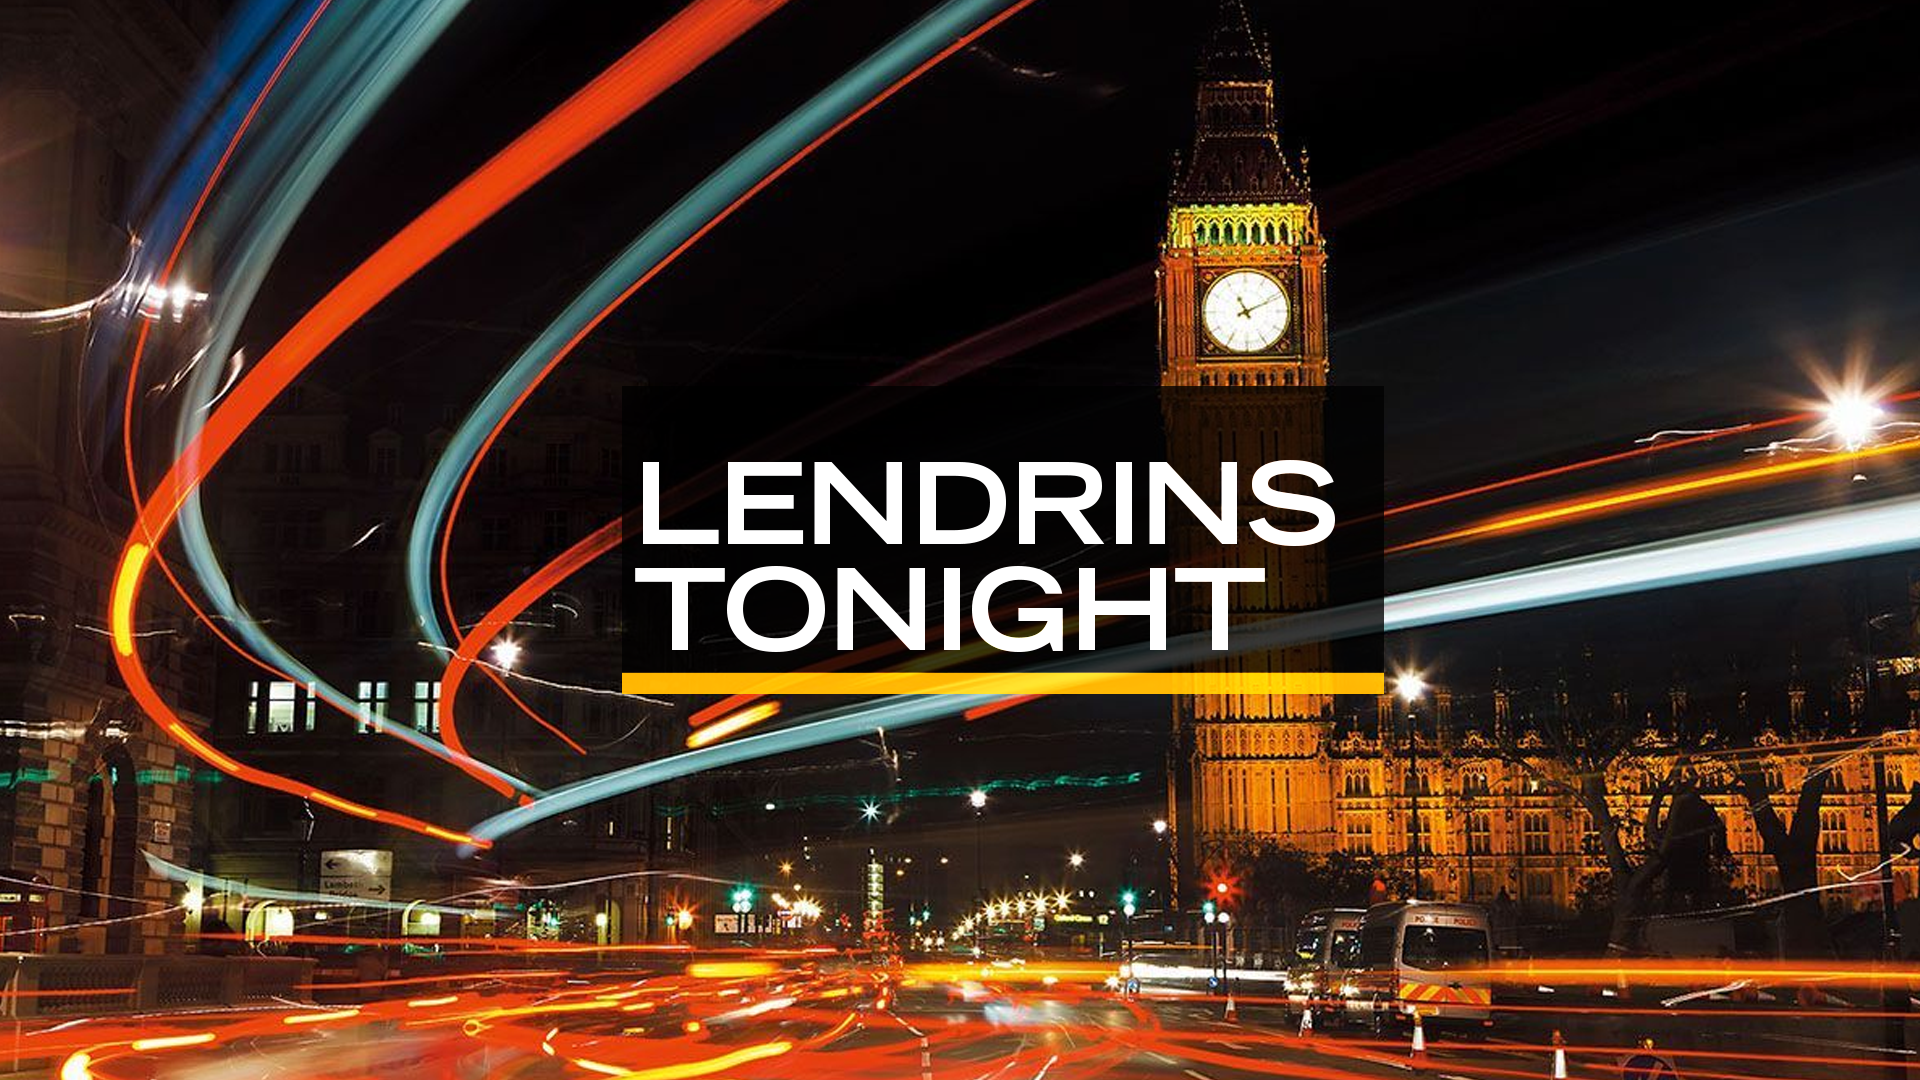 Lendrins Tonight